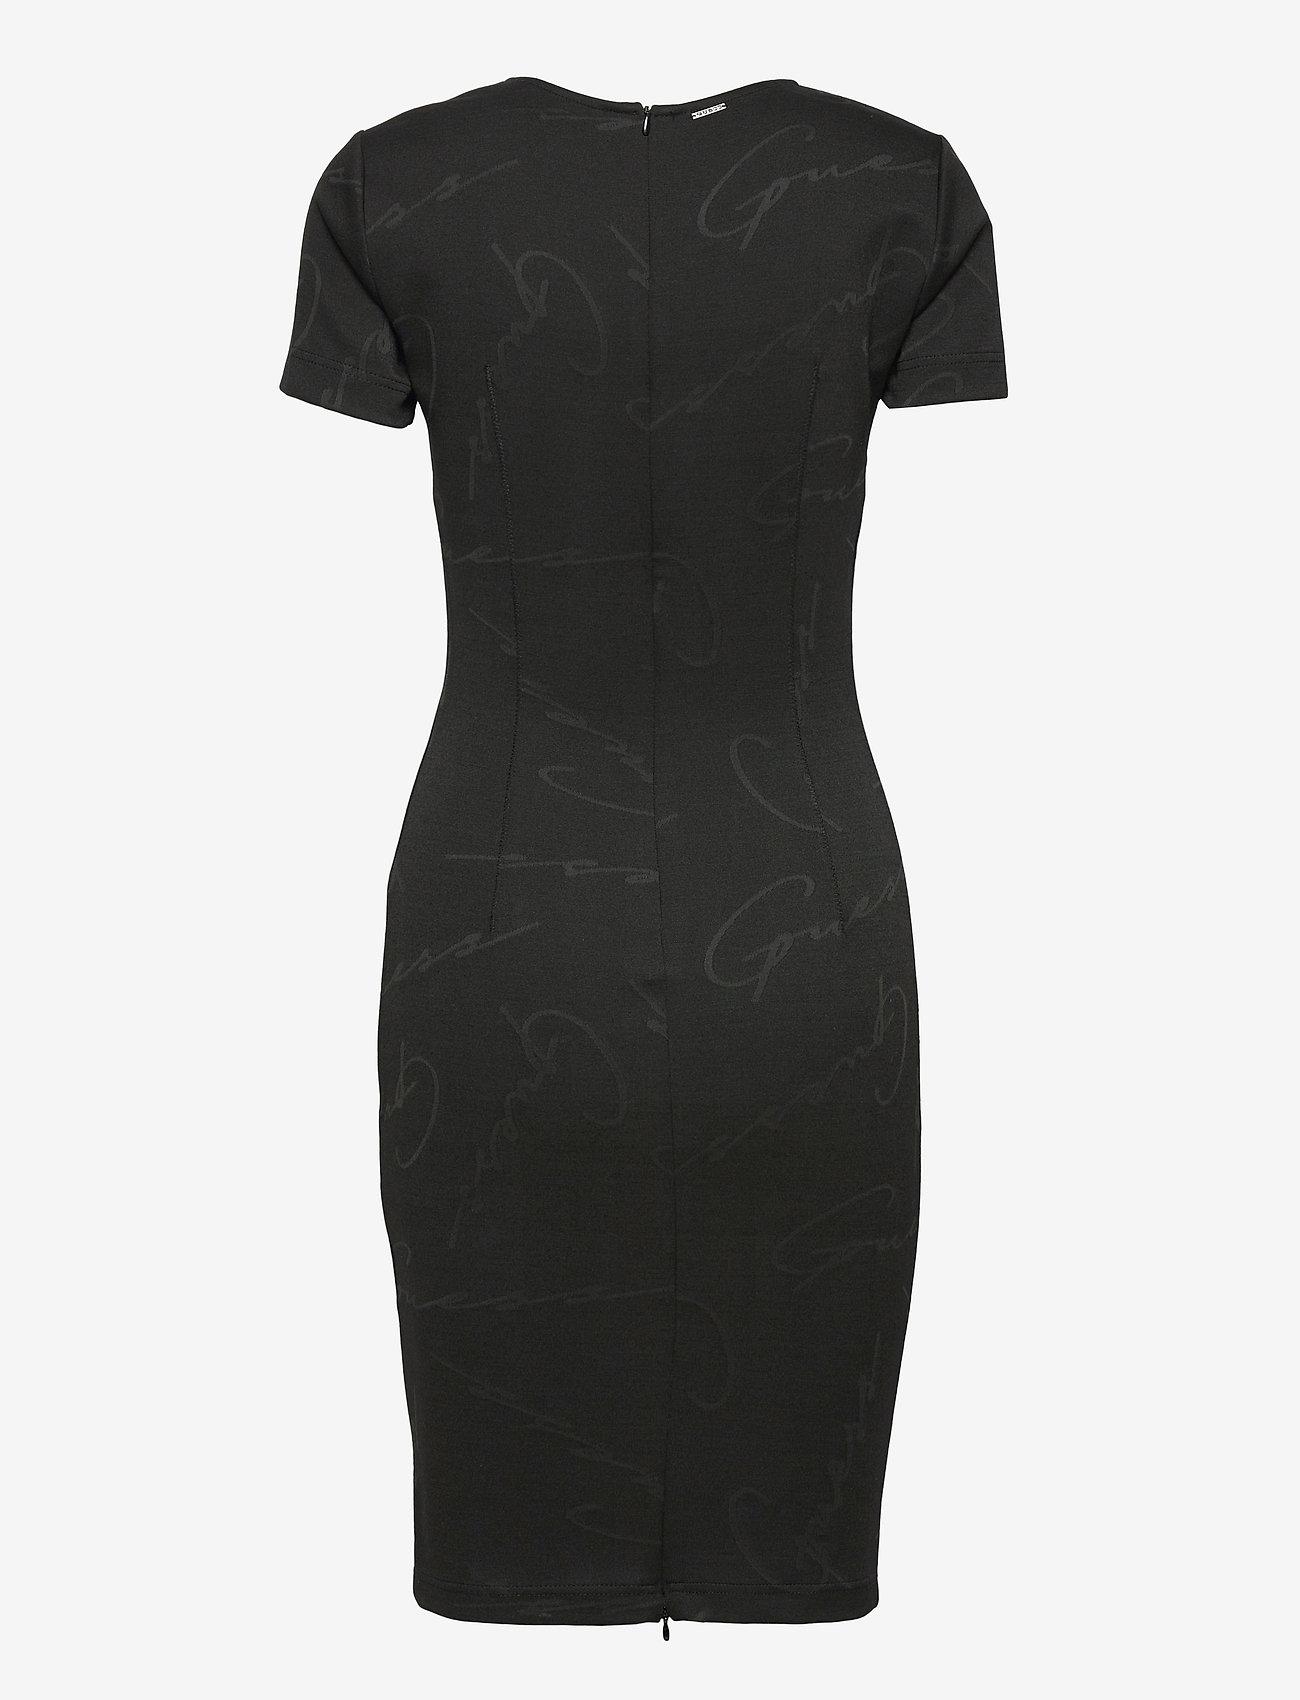 GUESS Jeans - RHODA DRESS - fodralklänningar - jet black a996 - 1